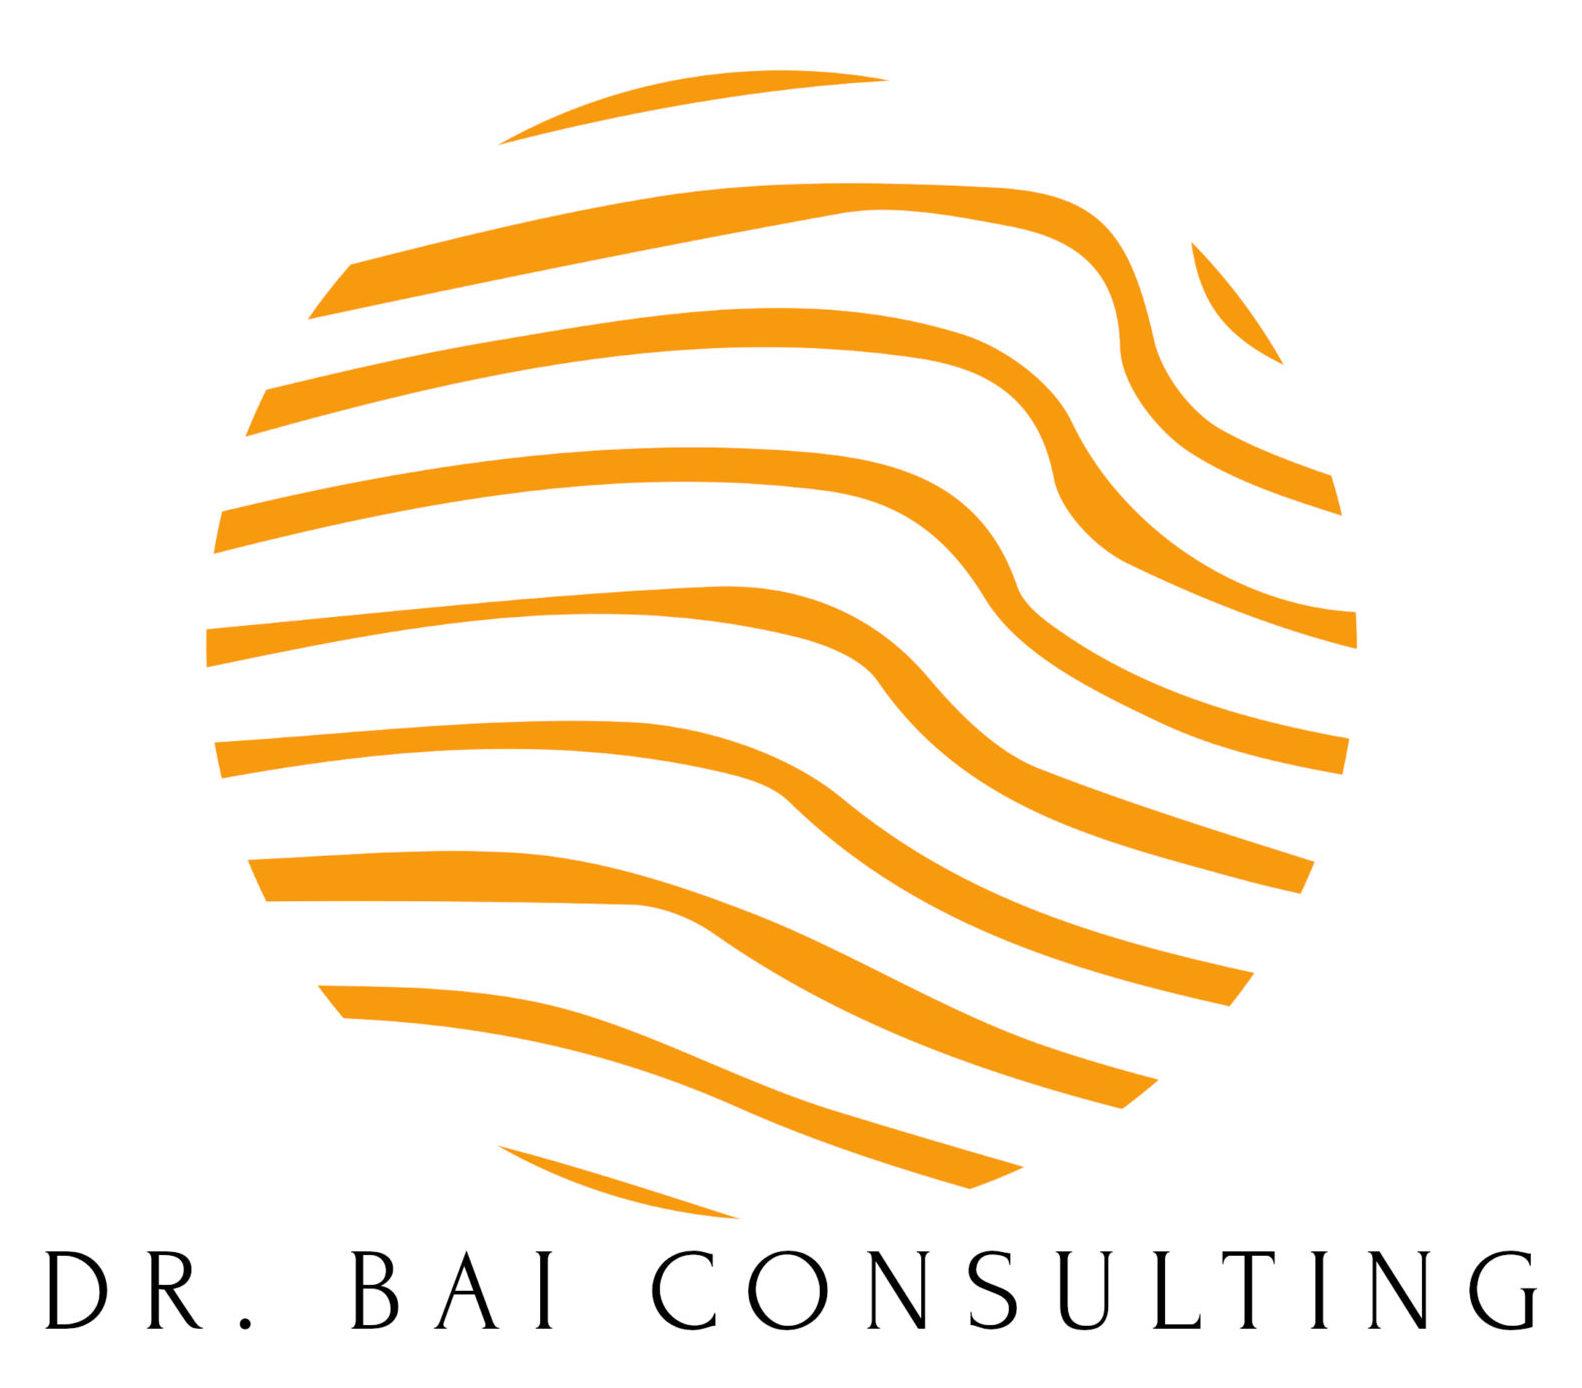 Dr. Bai Consulting